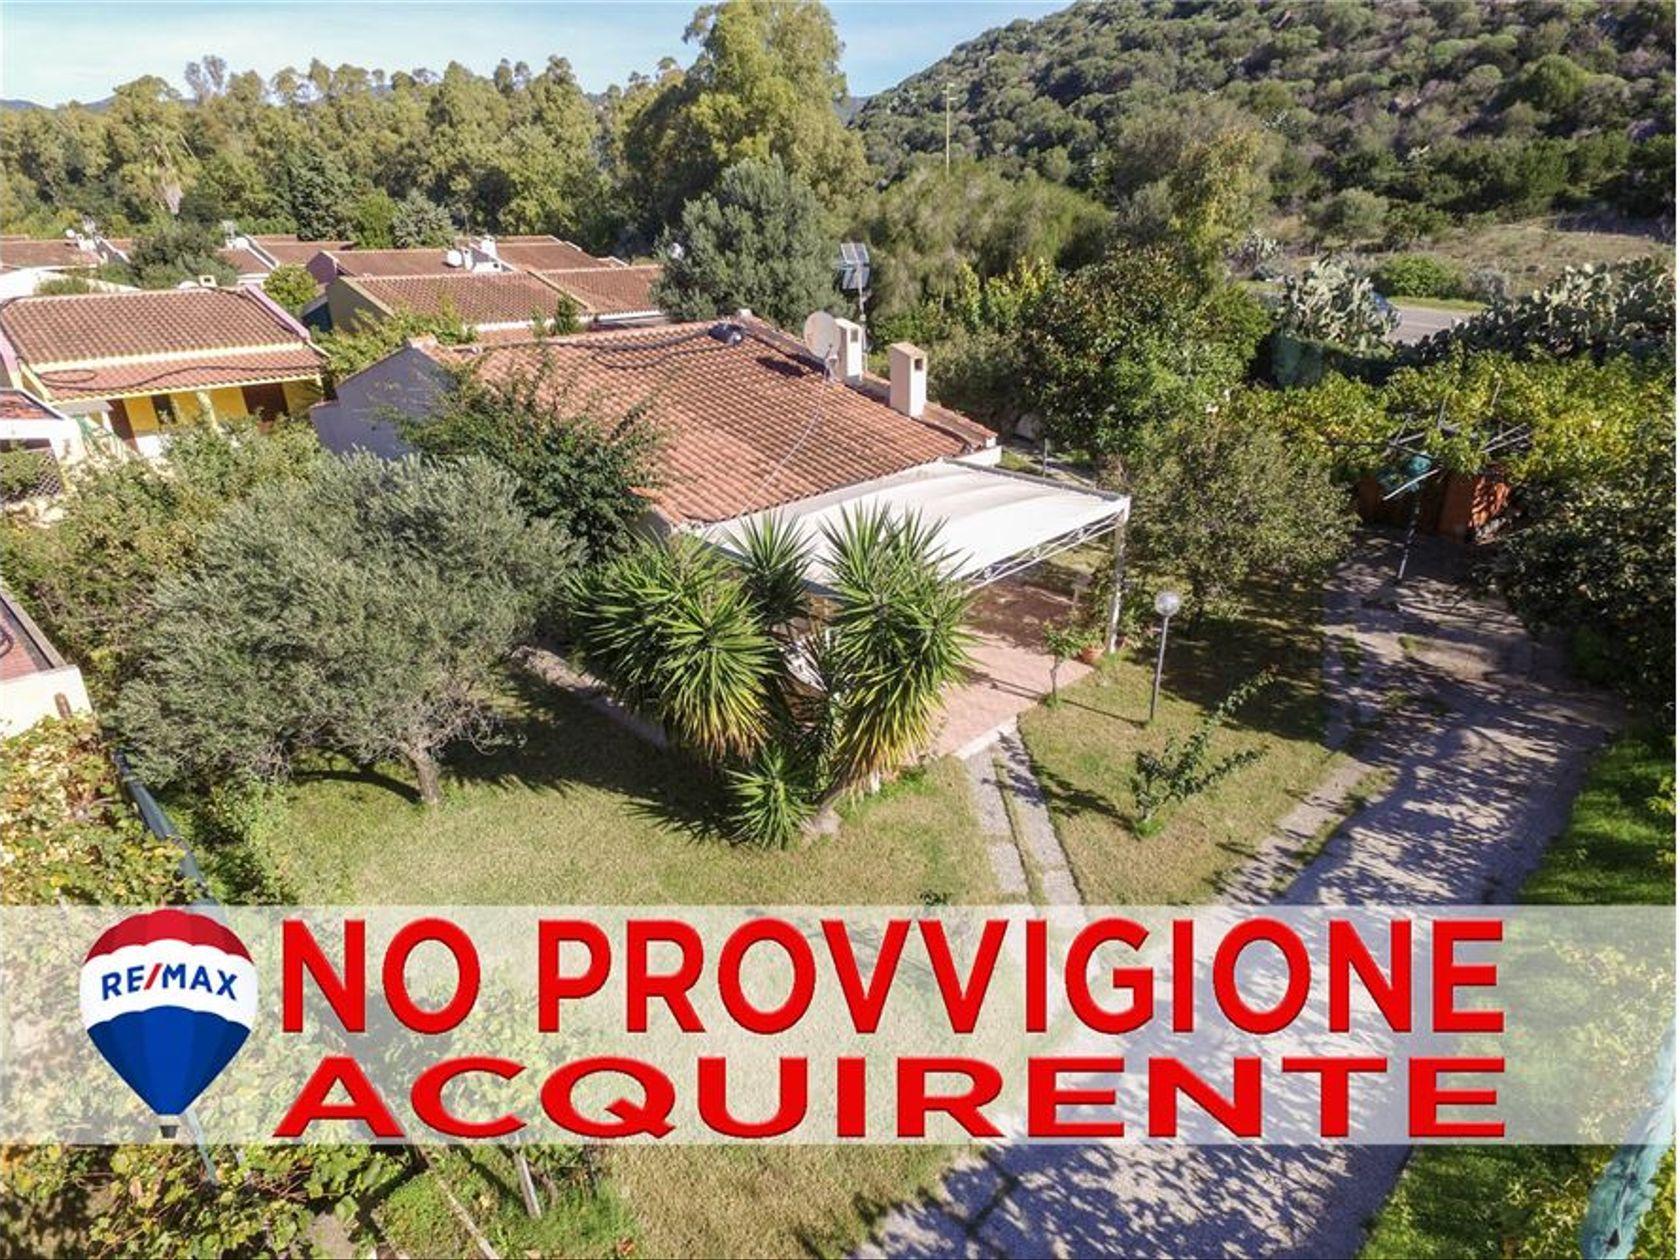 Villa singola Geremeas, Maracalagonis, CA Vendita